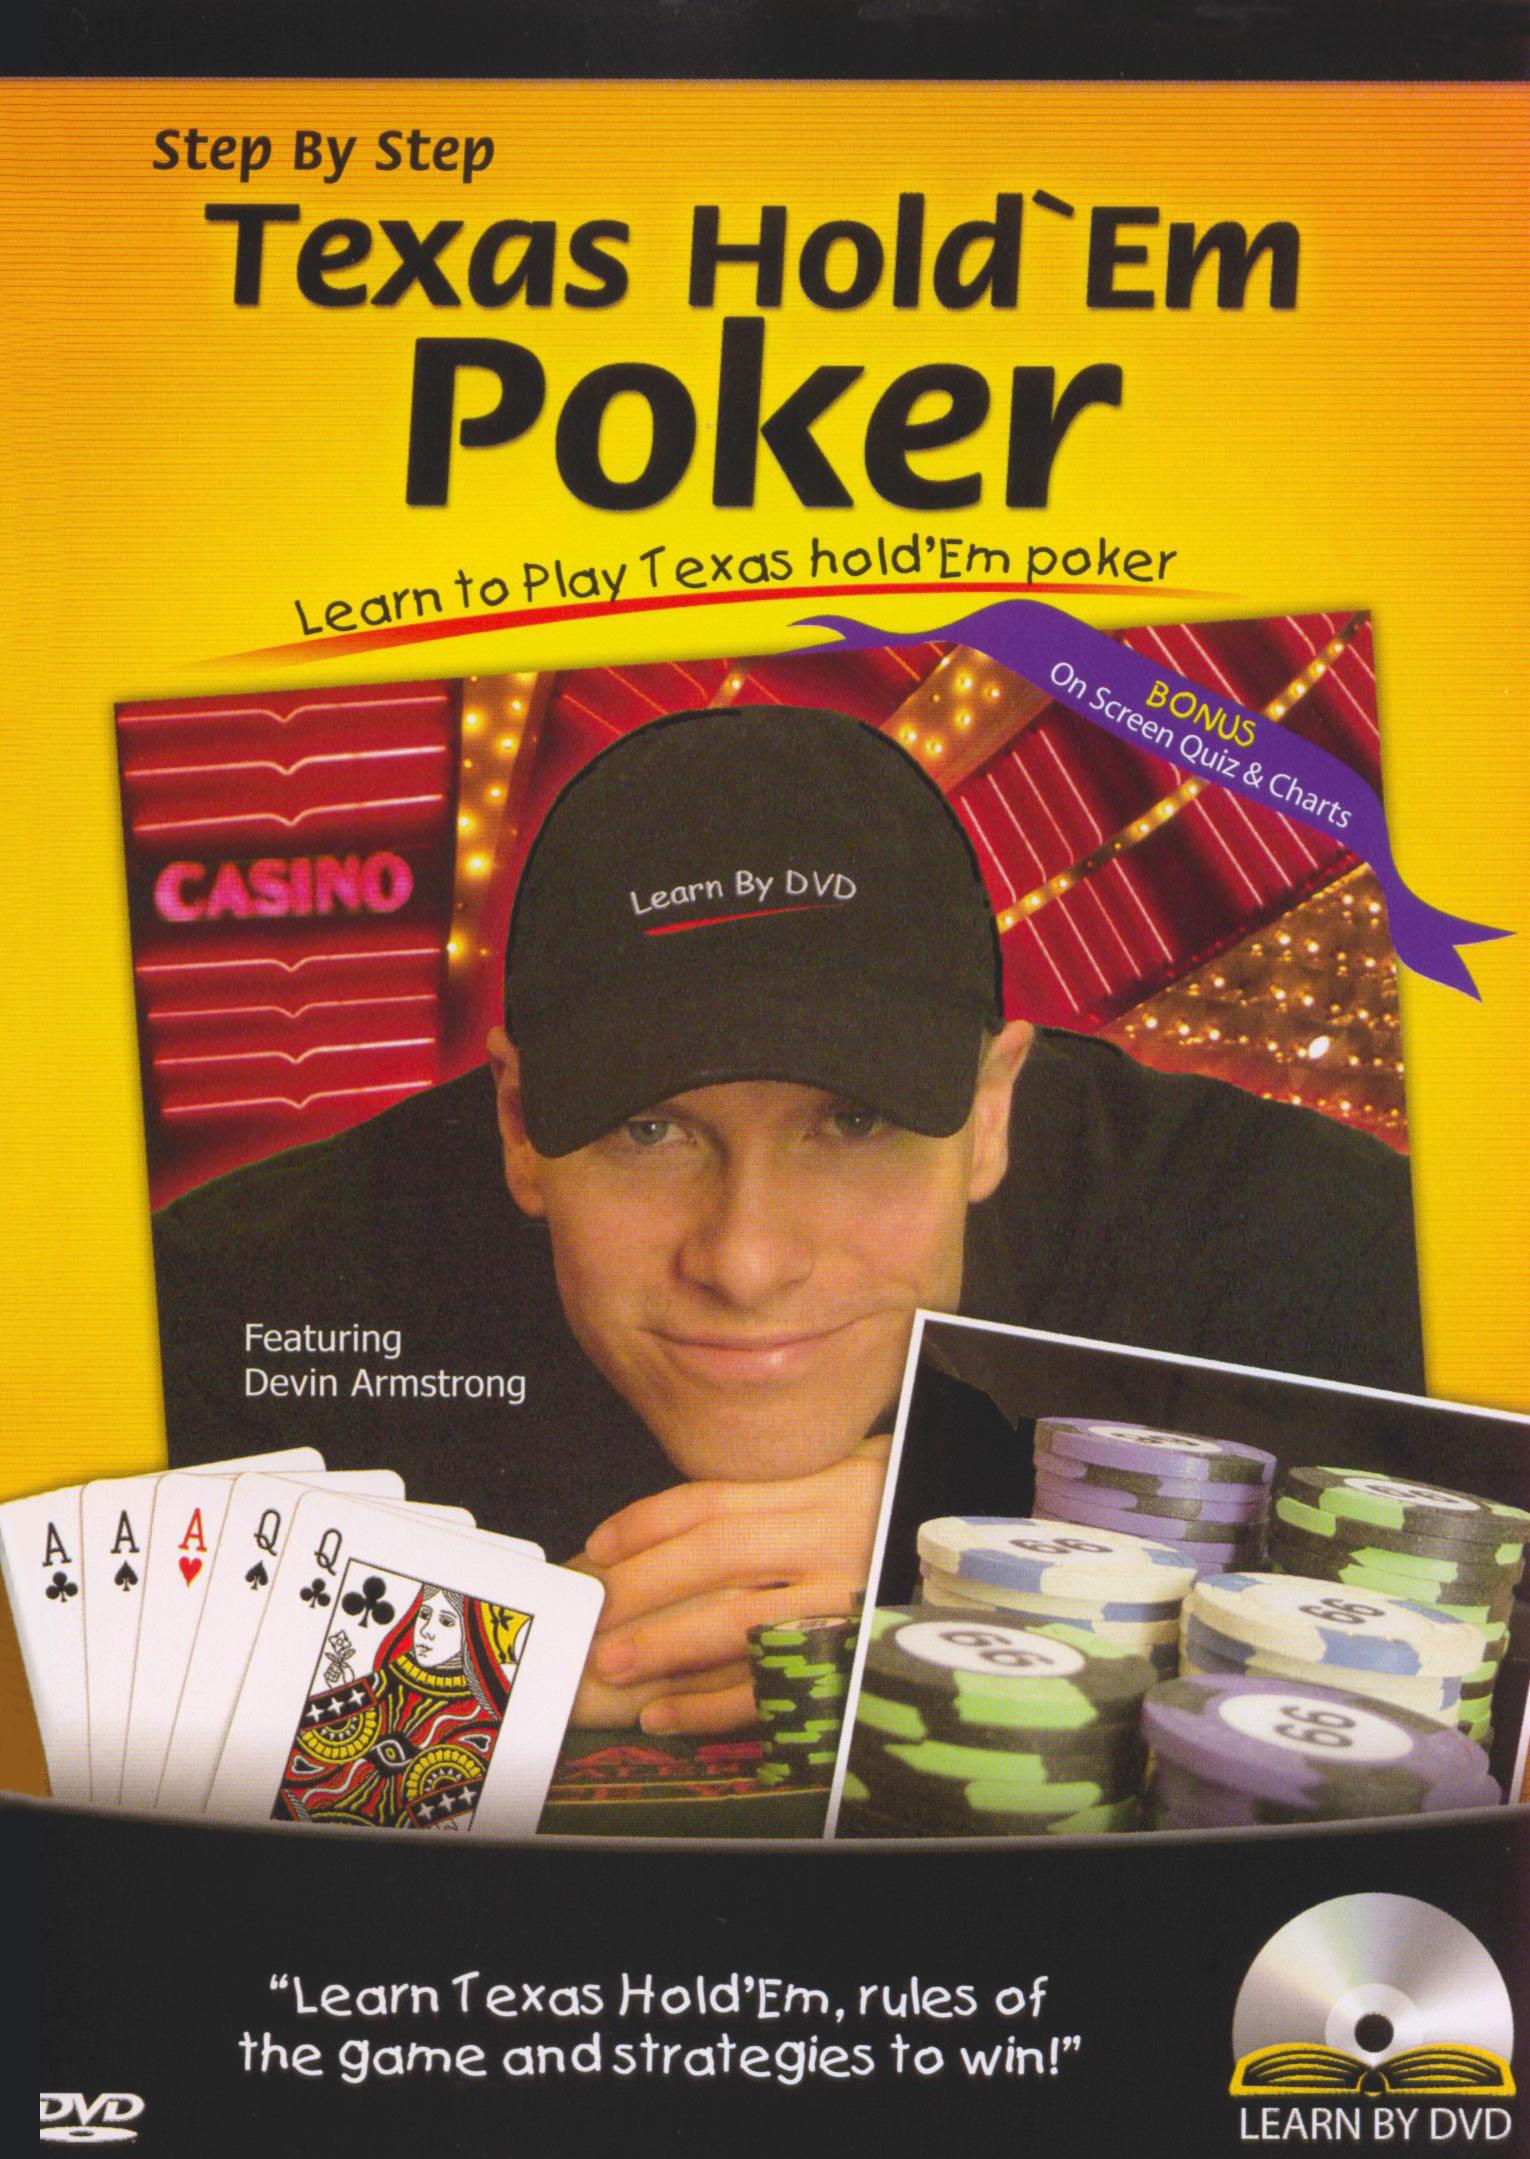 Step by Step: Texas Hold'em Poker